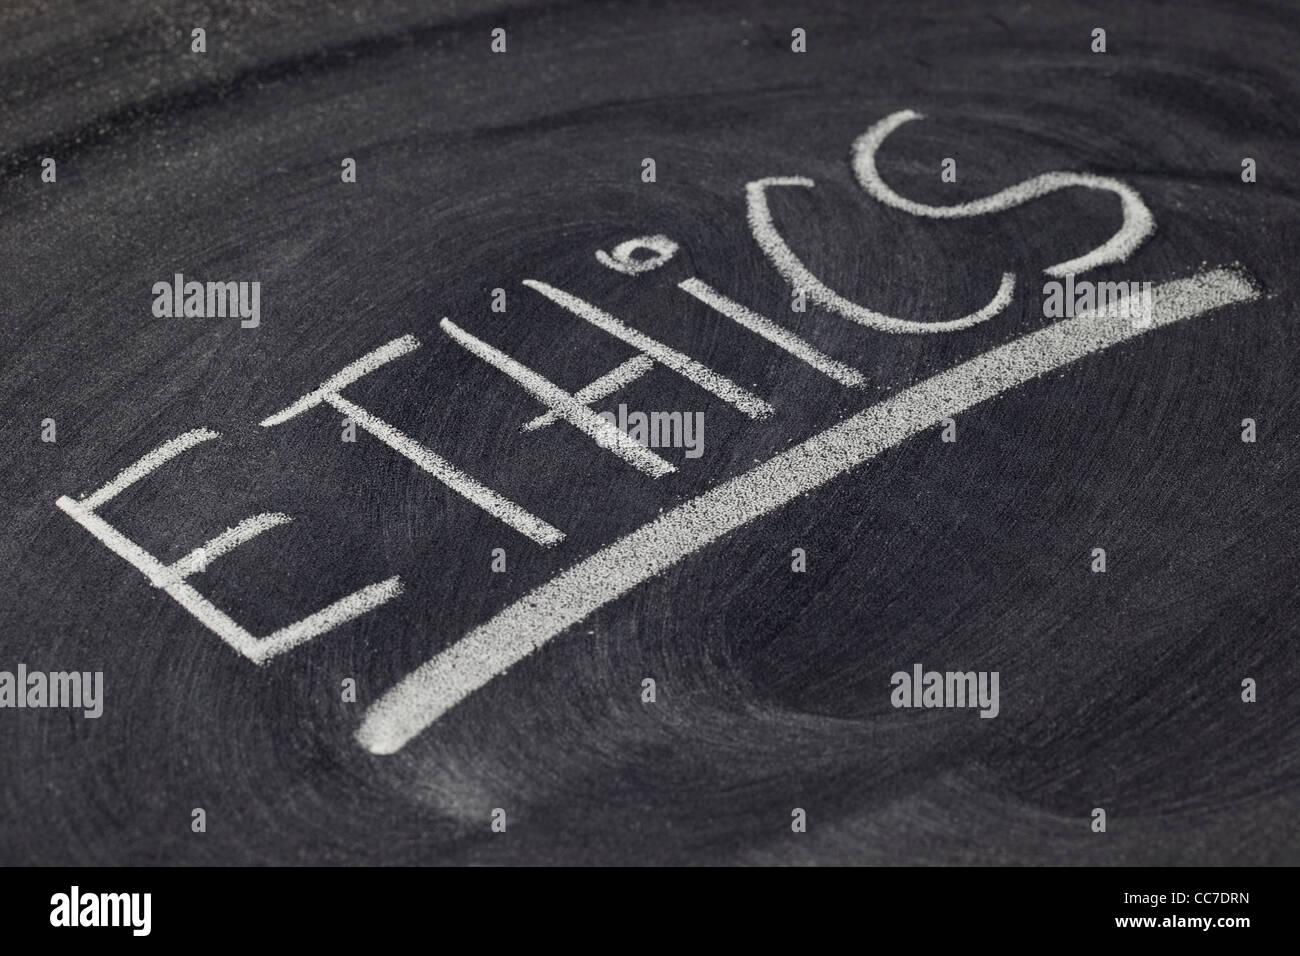 ethics word - white chalk handwriting on blackboard - Stock Image